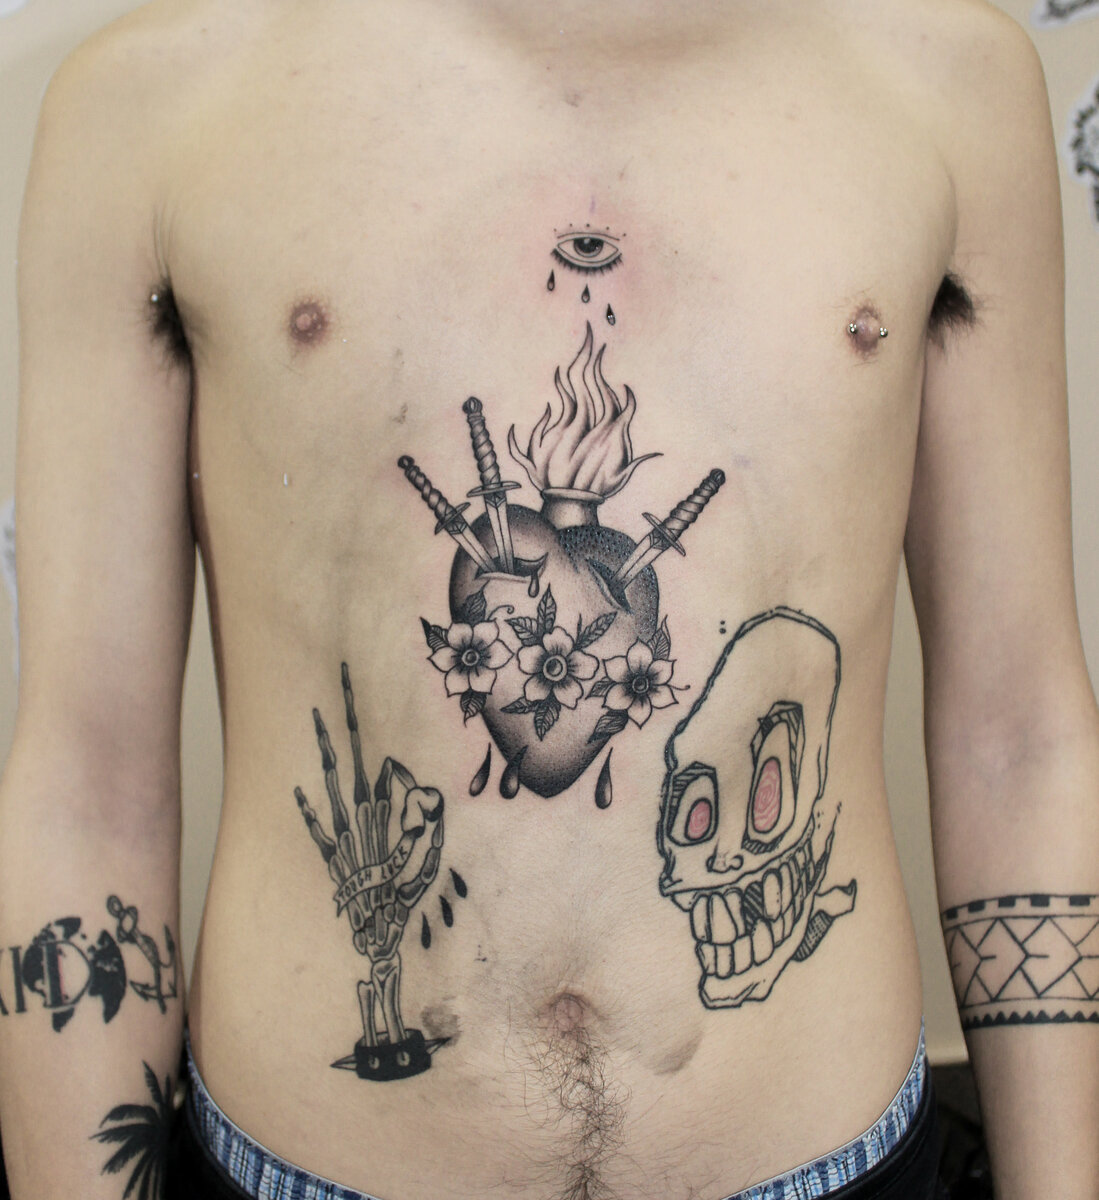 patricia-ortega-lilith-tattoo-artist-chest-tattoo